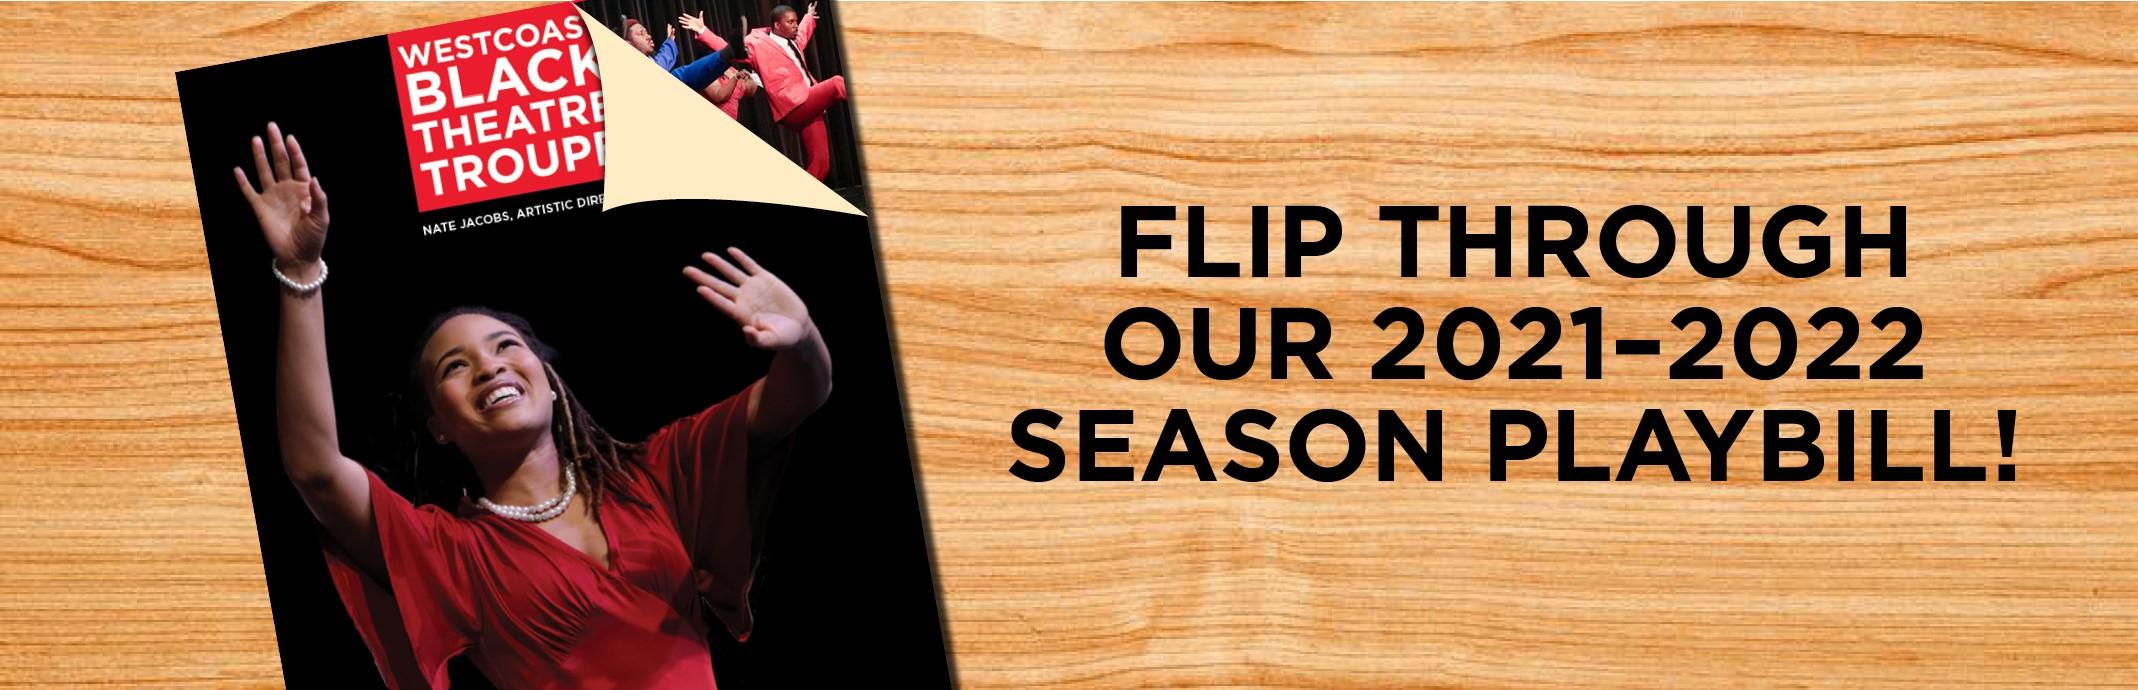 Flip Through Our 2021-2022 Season Playbill!